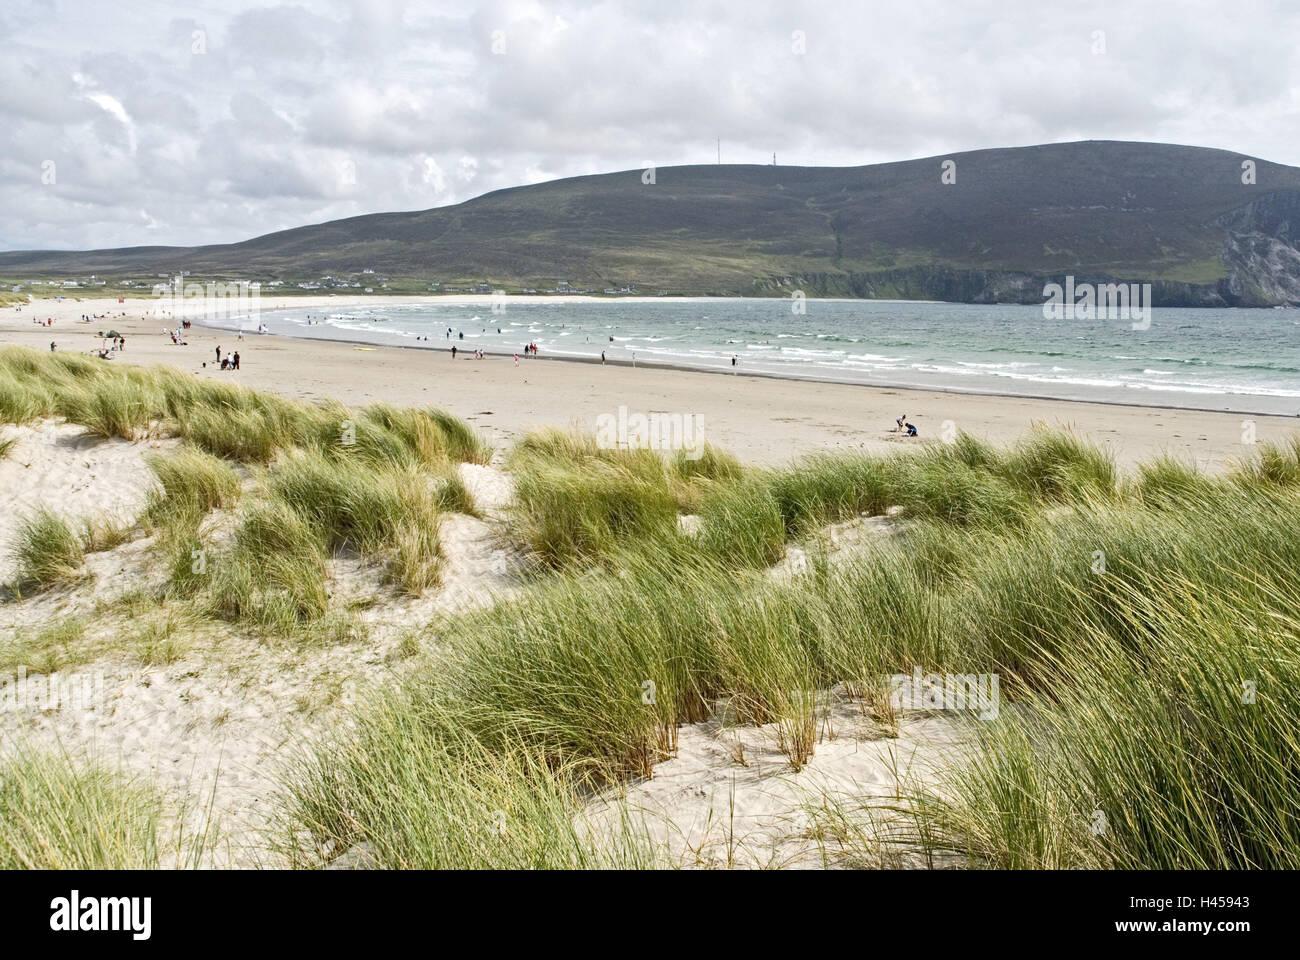 Ireland, Mayo, Achilles Iceland, Keel, beach, tourist, dune grass, Connacht, coast, sandy beach, dunes, sea, bay, - Stock Image